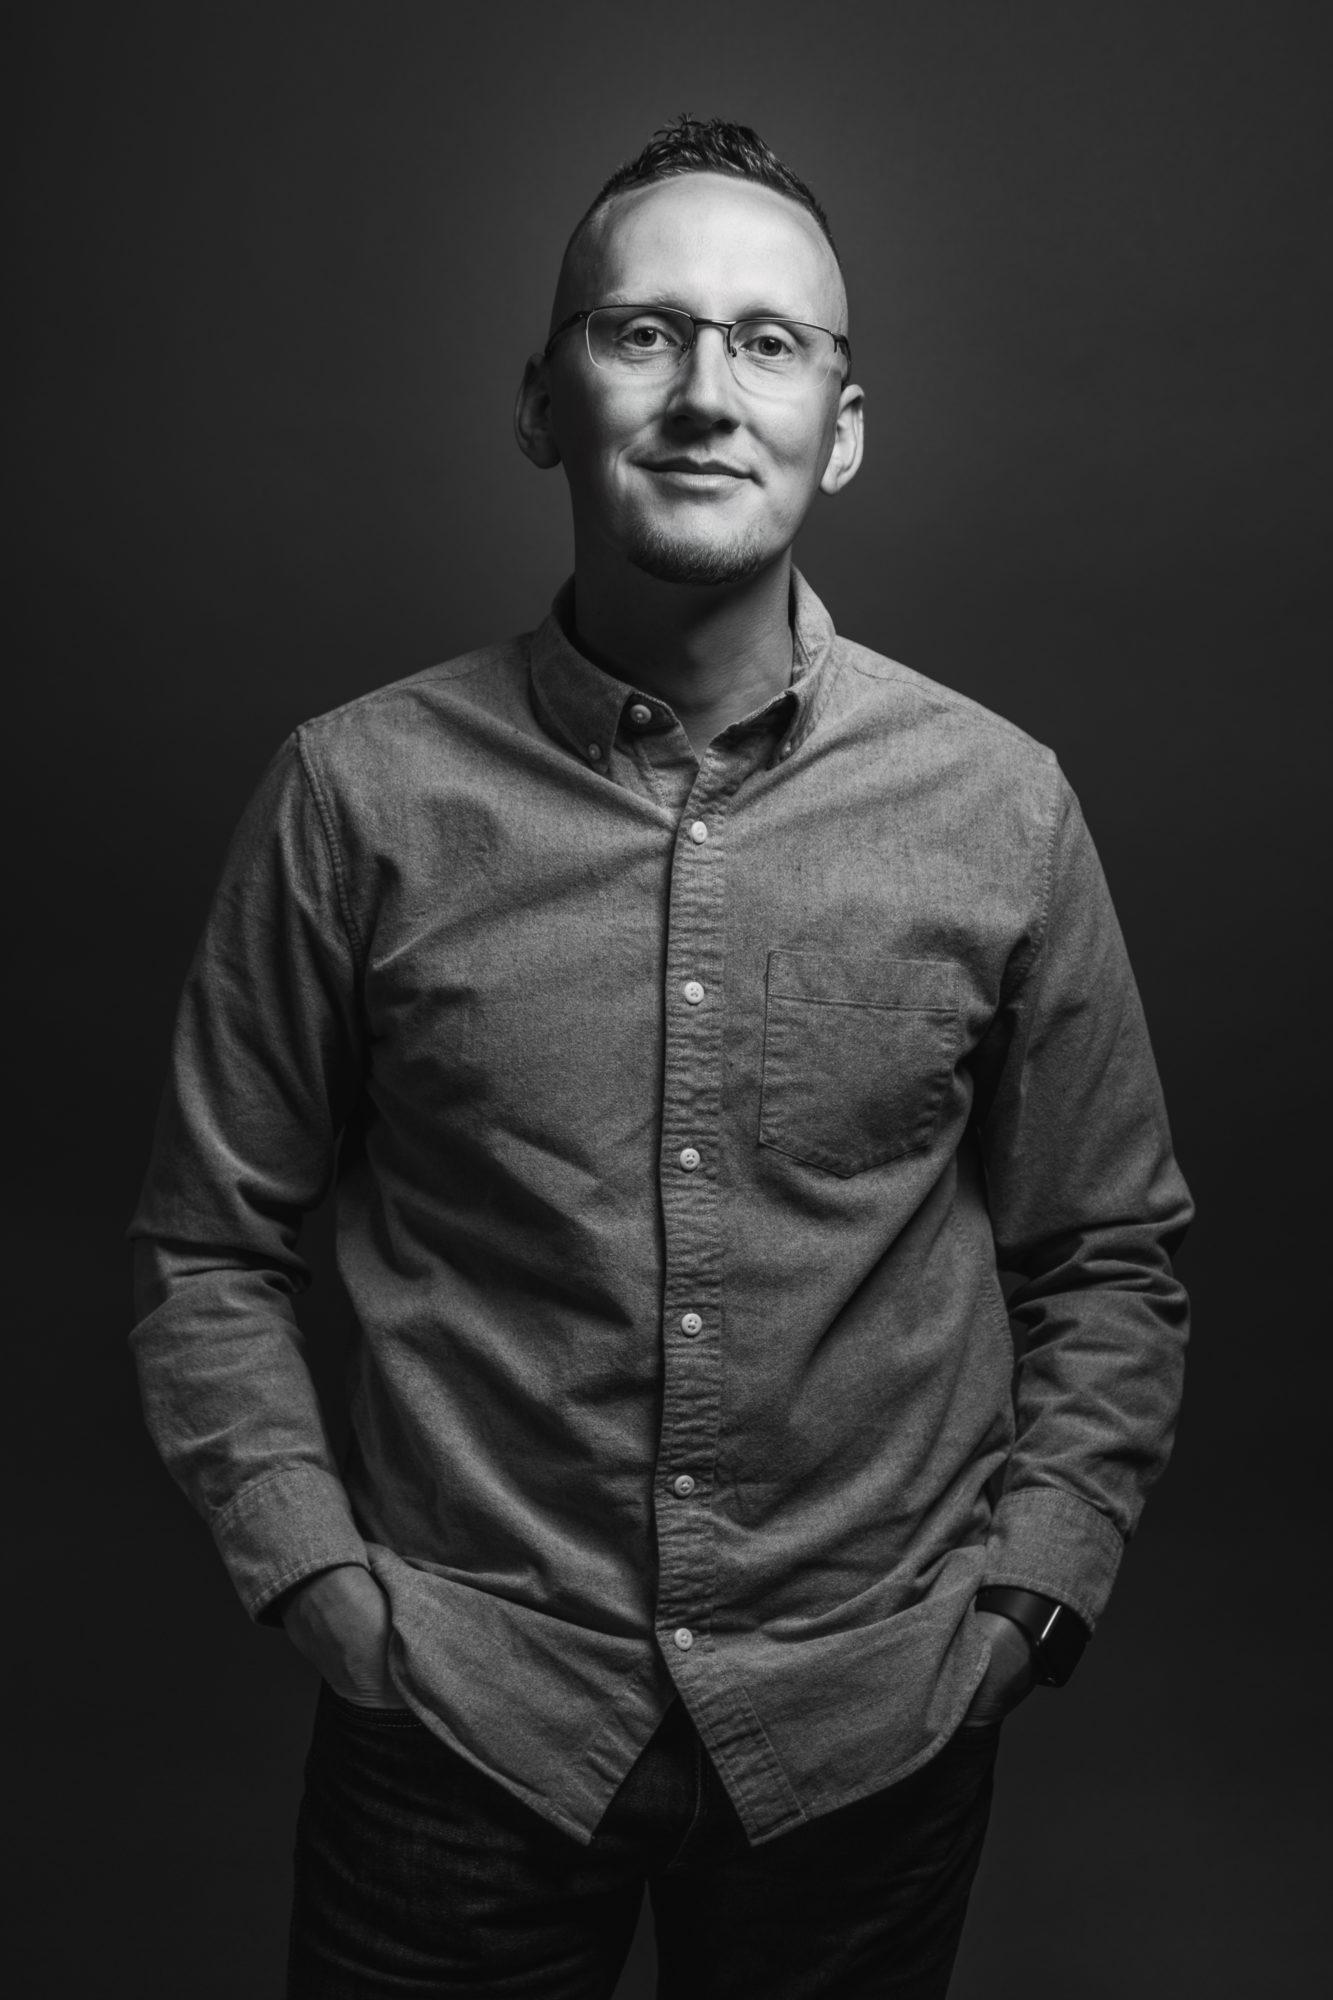 Dan Watkins | 2021 40 Under 40